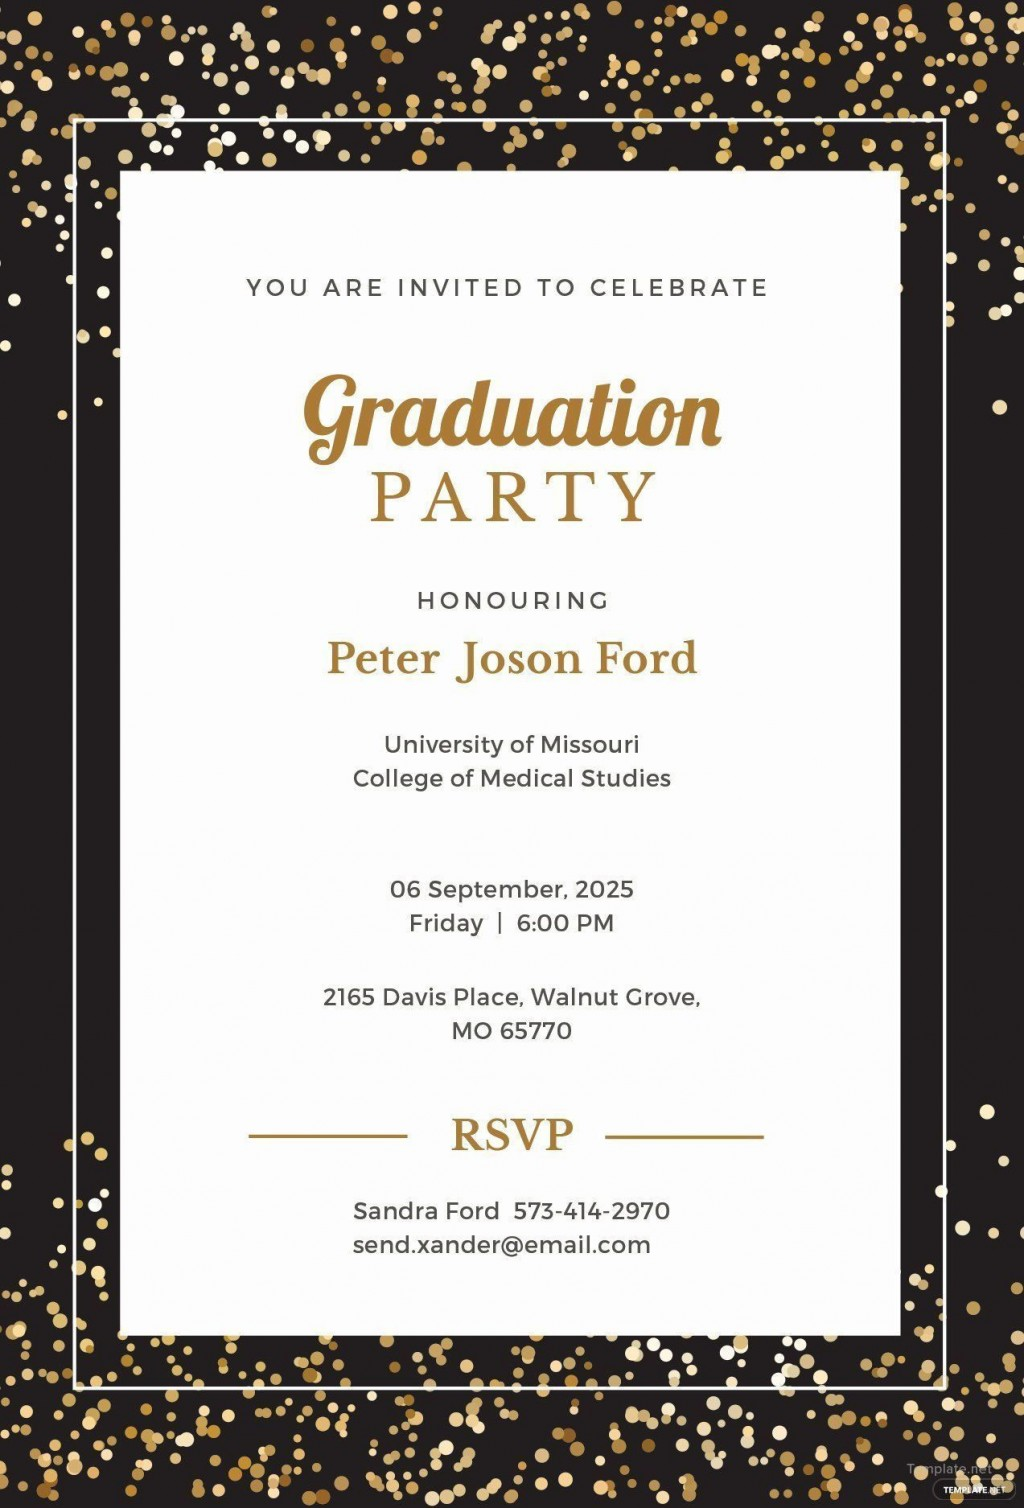 008 Sensational Microsoft Word Graduation Invitation Template Idea  PartyLarge